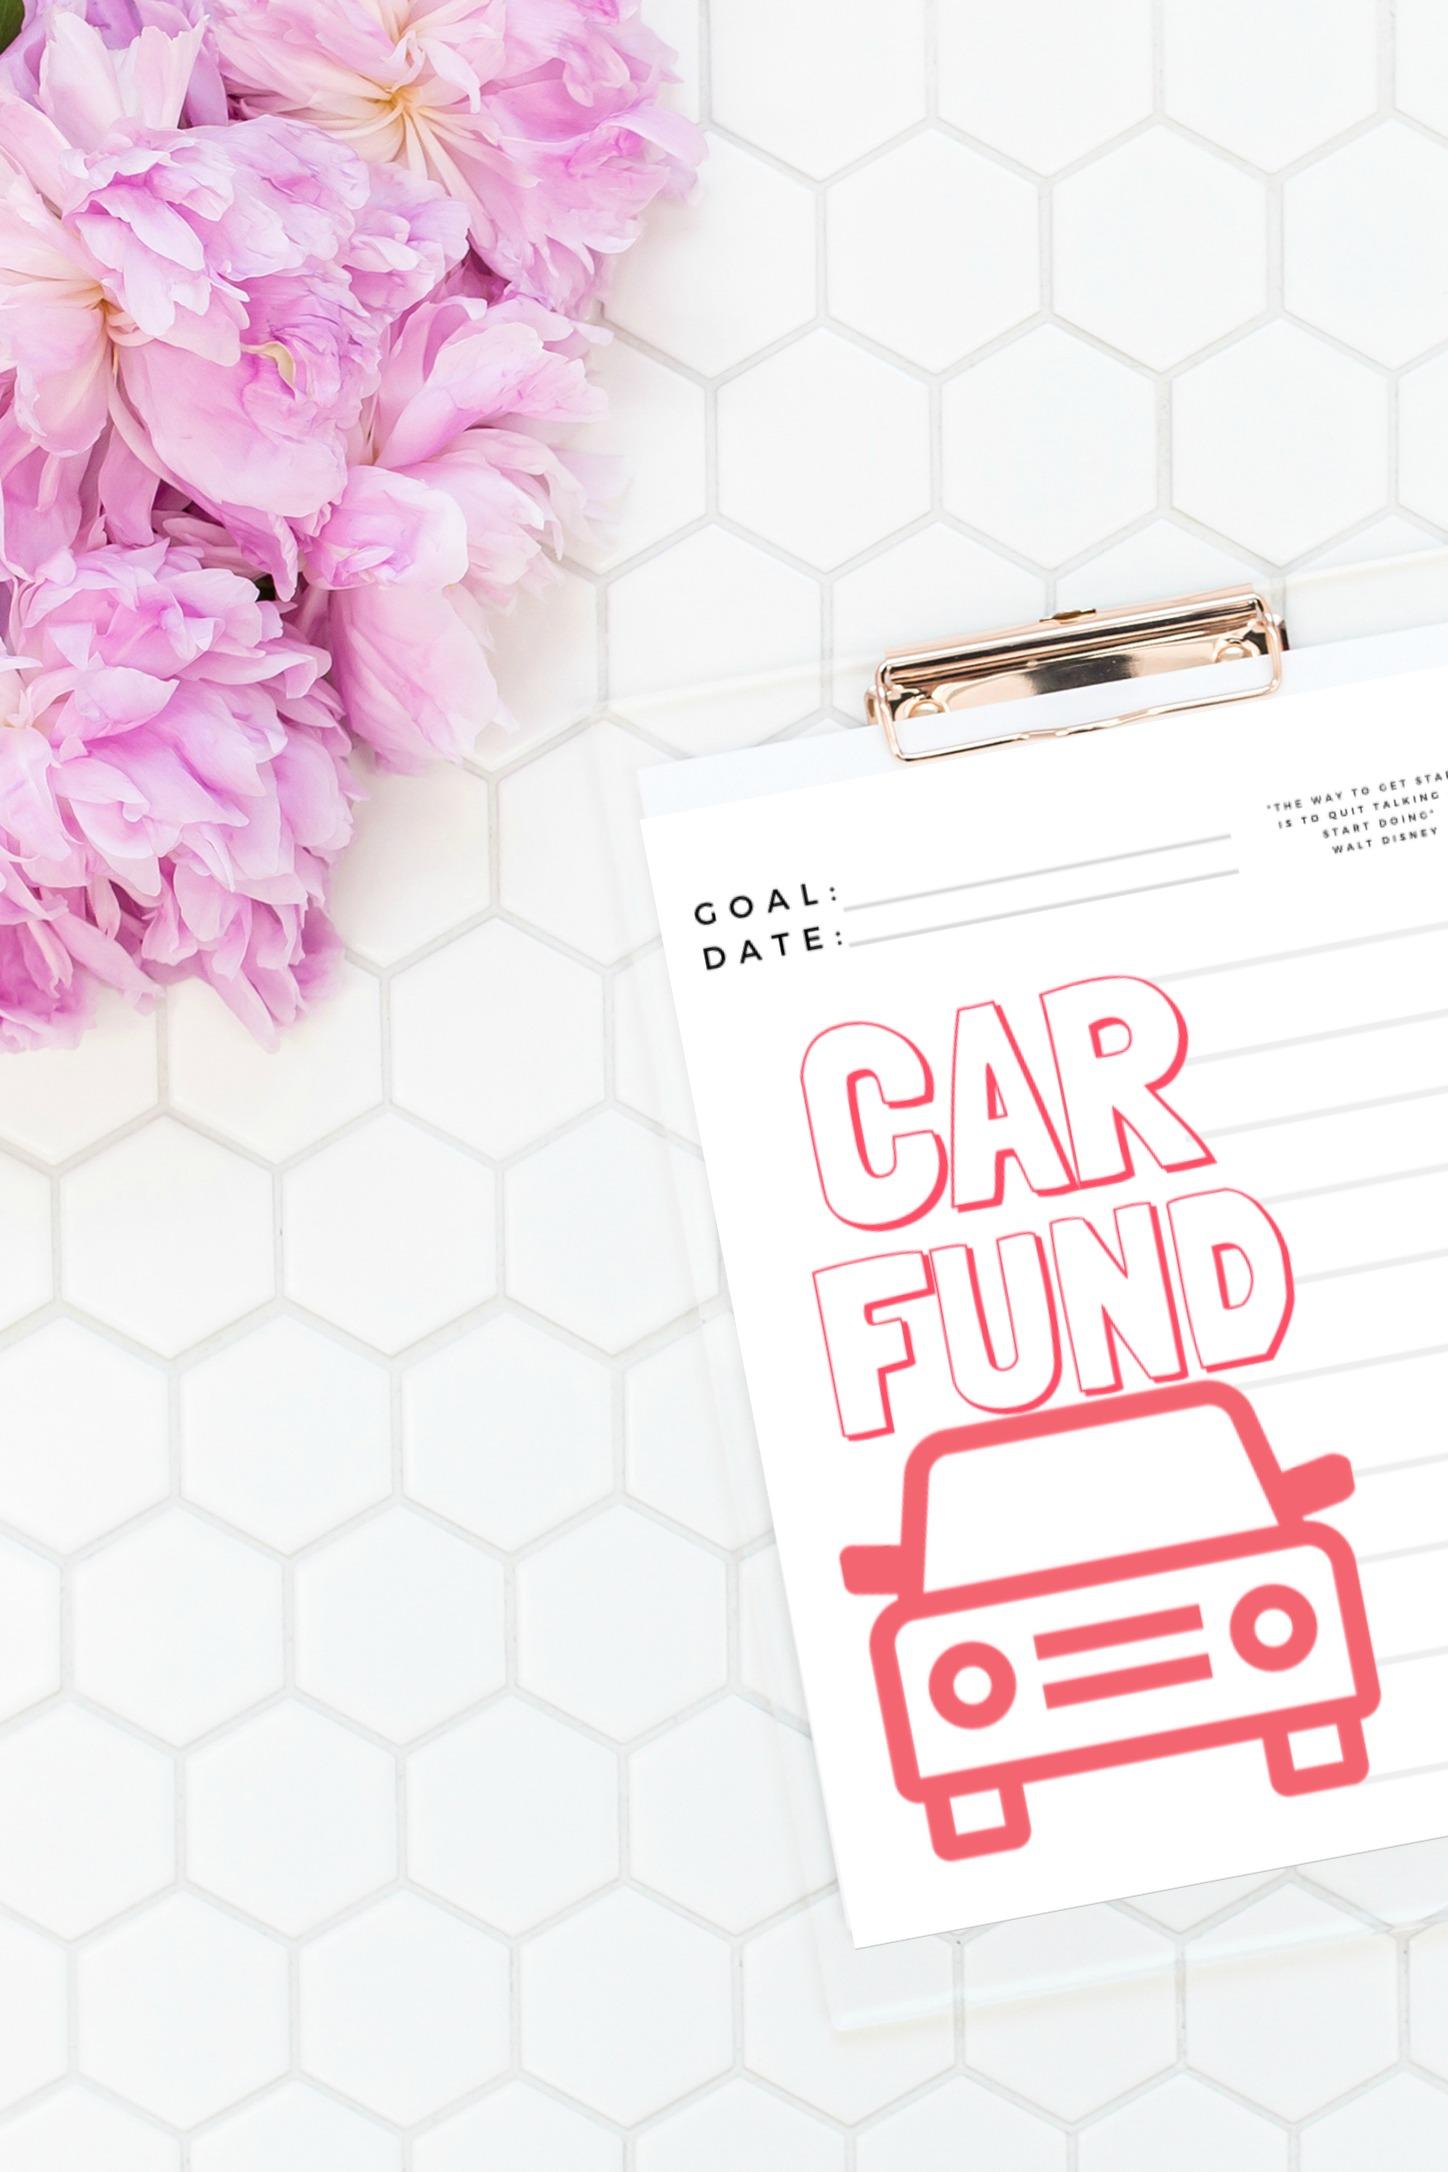 debt free car fund printable.jpg